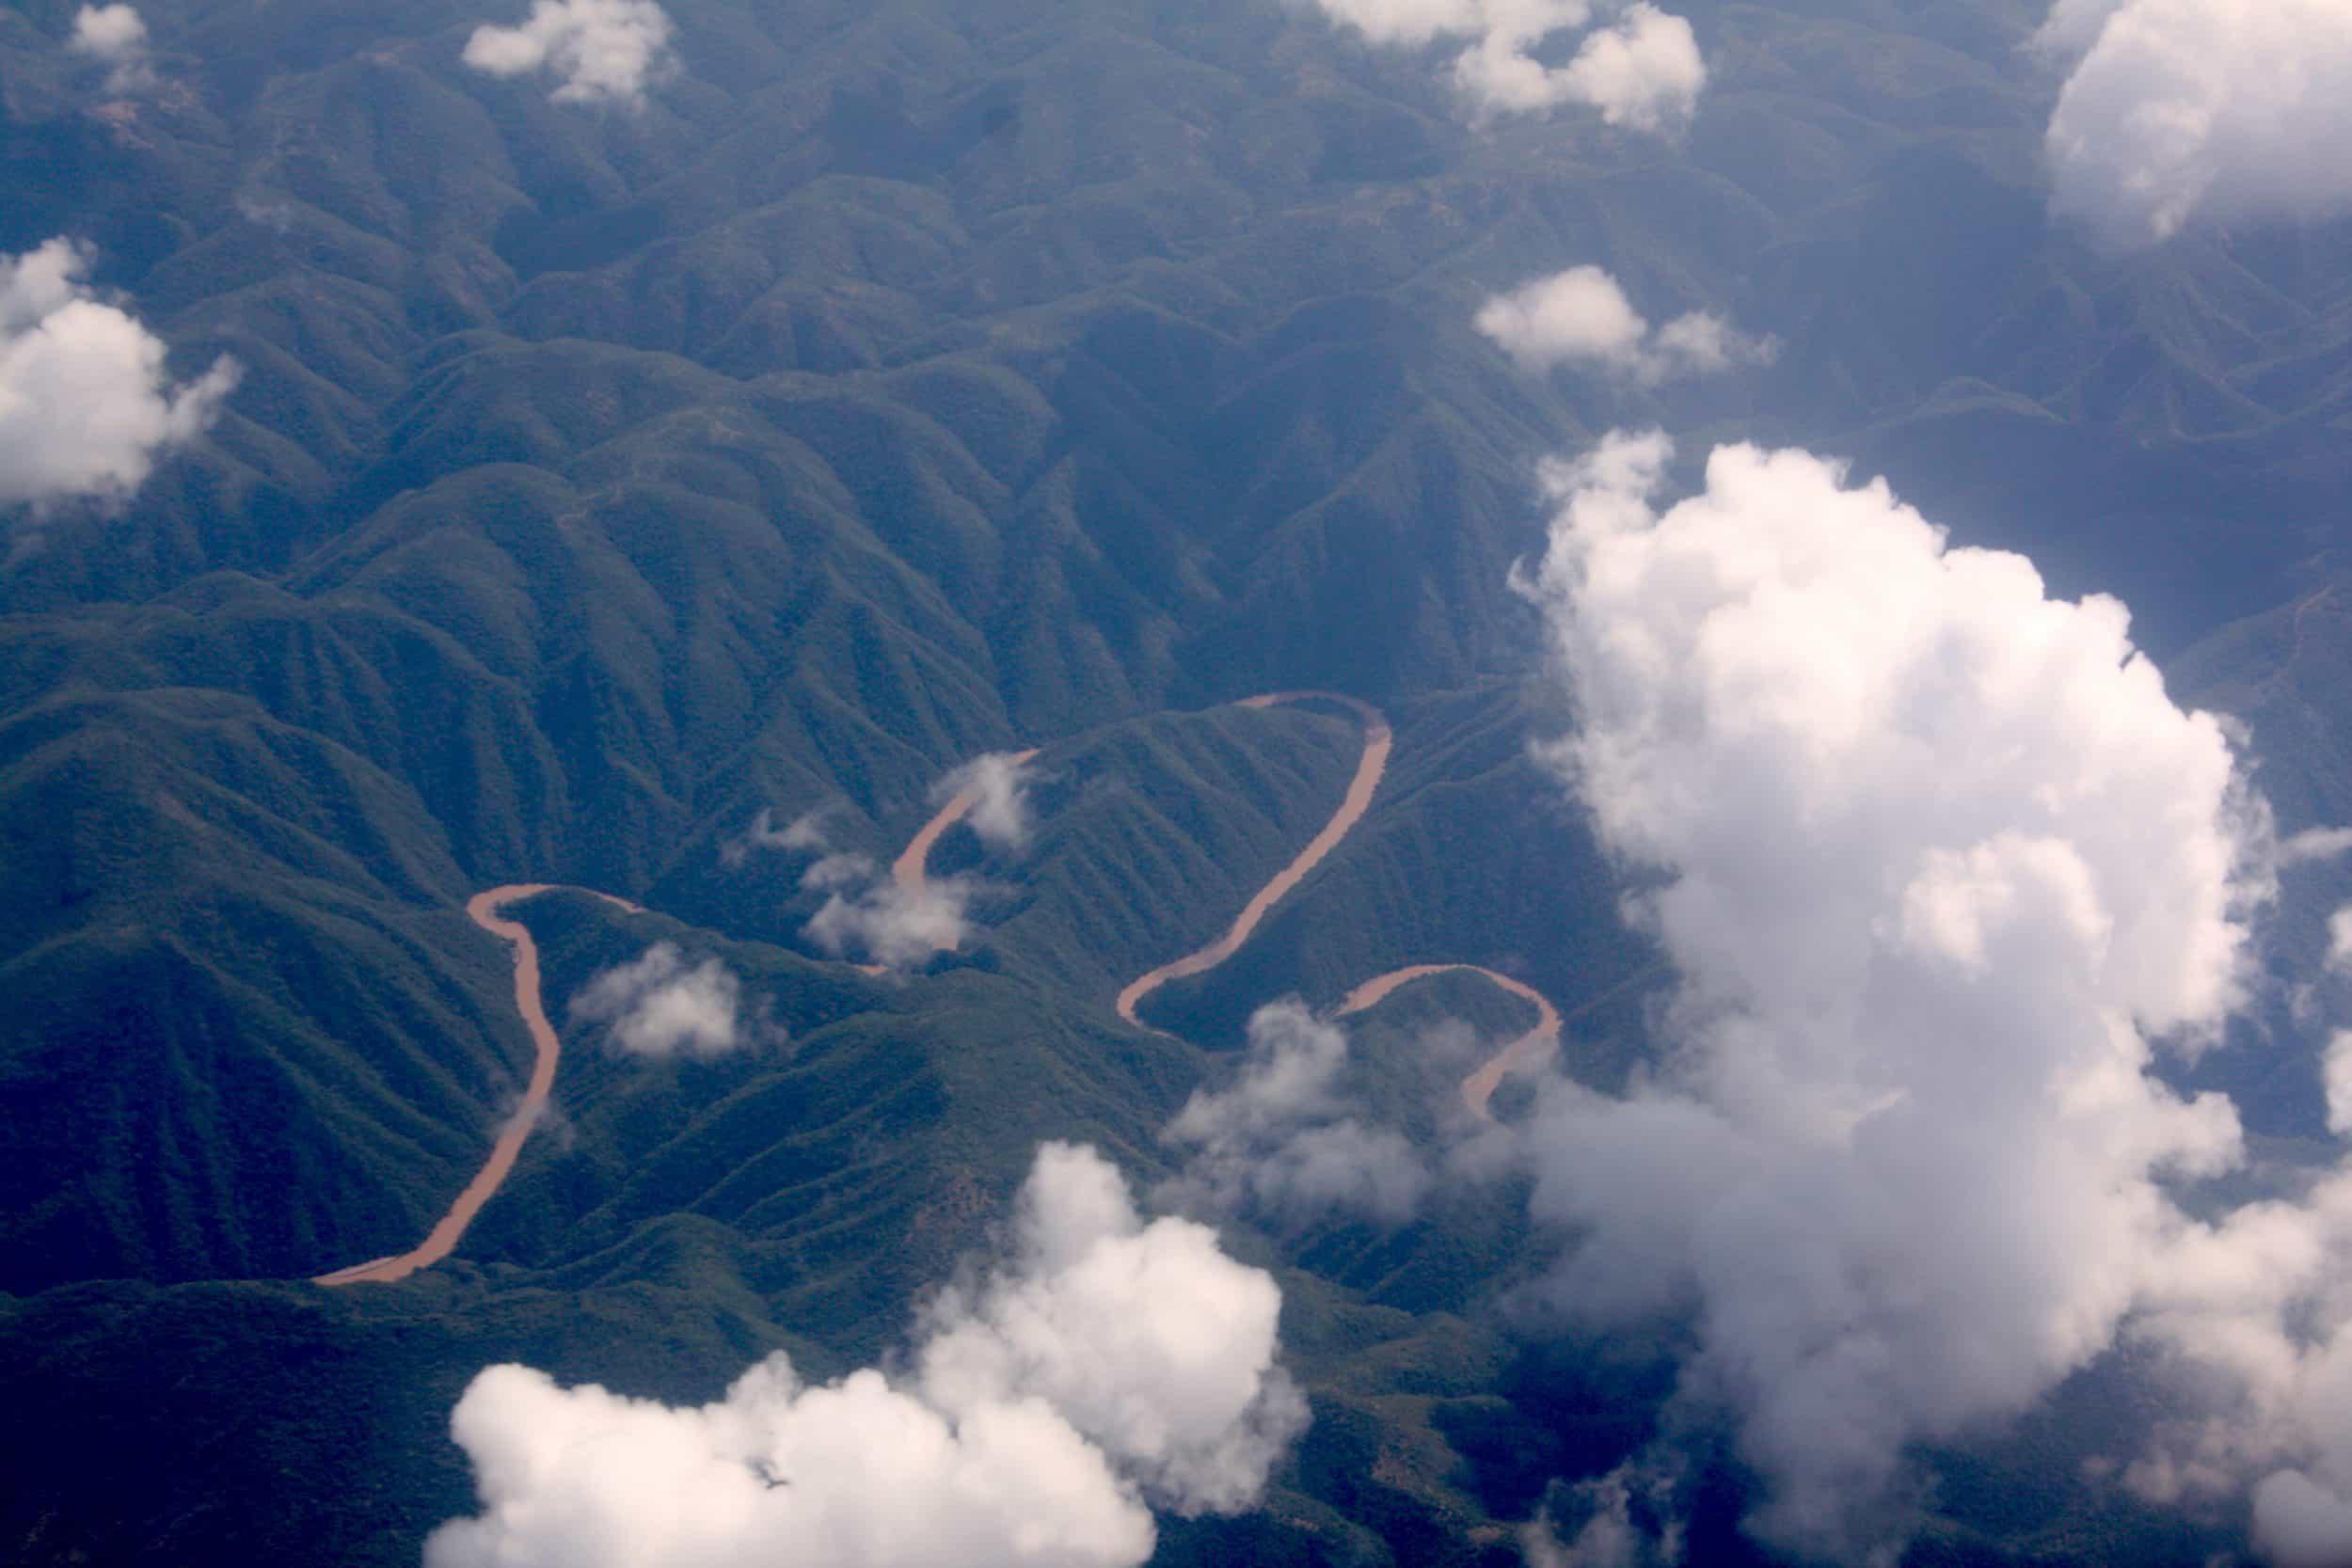 Mexicobloggen dag 1 – Reisen til Puerto Escondido